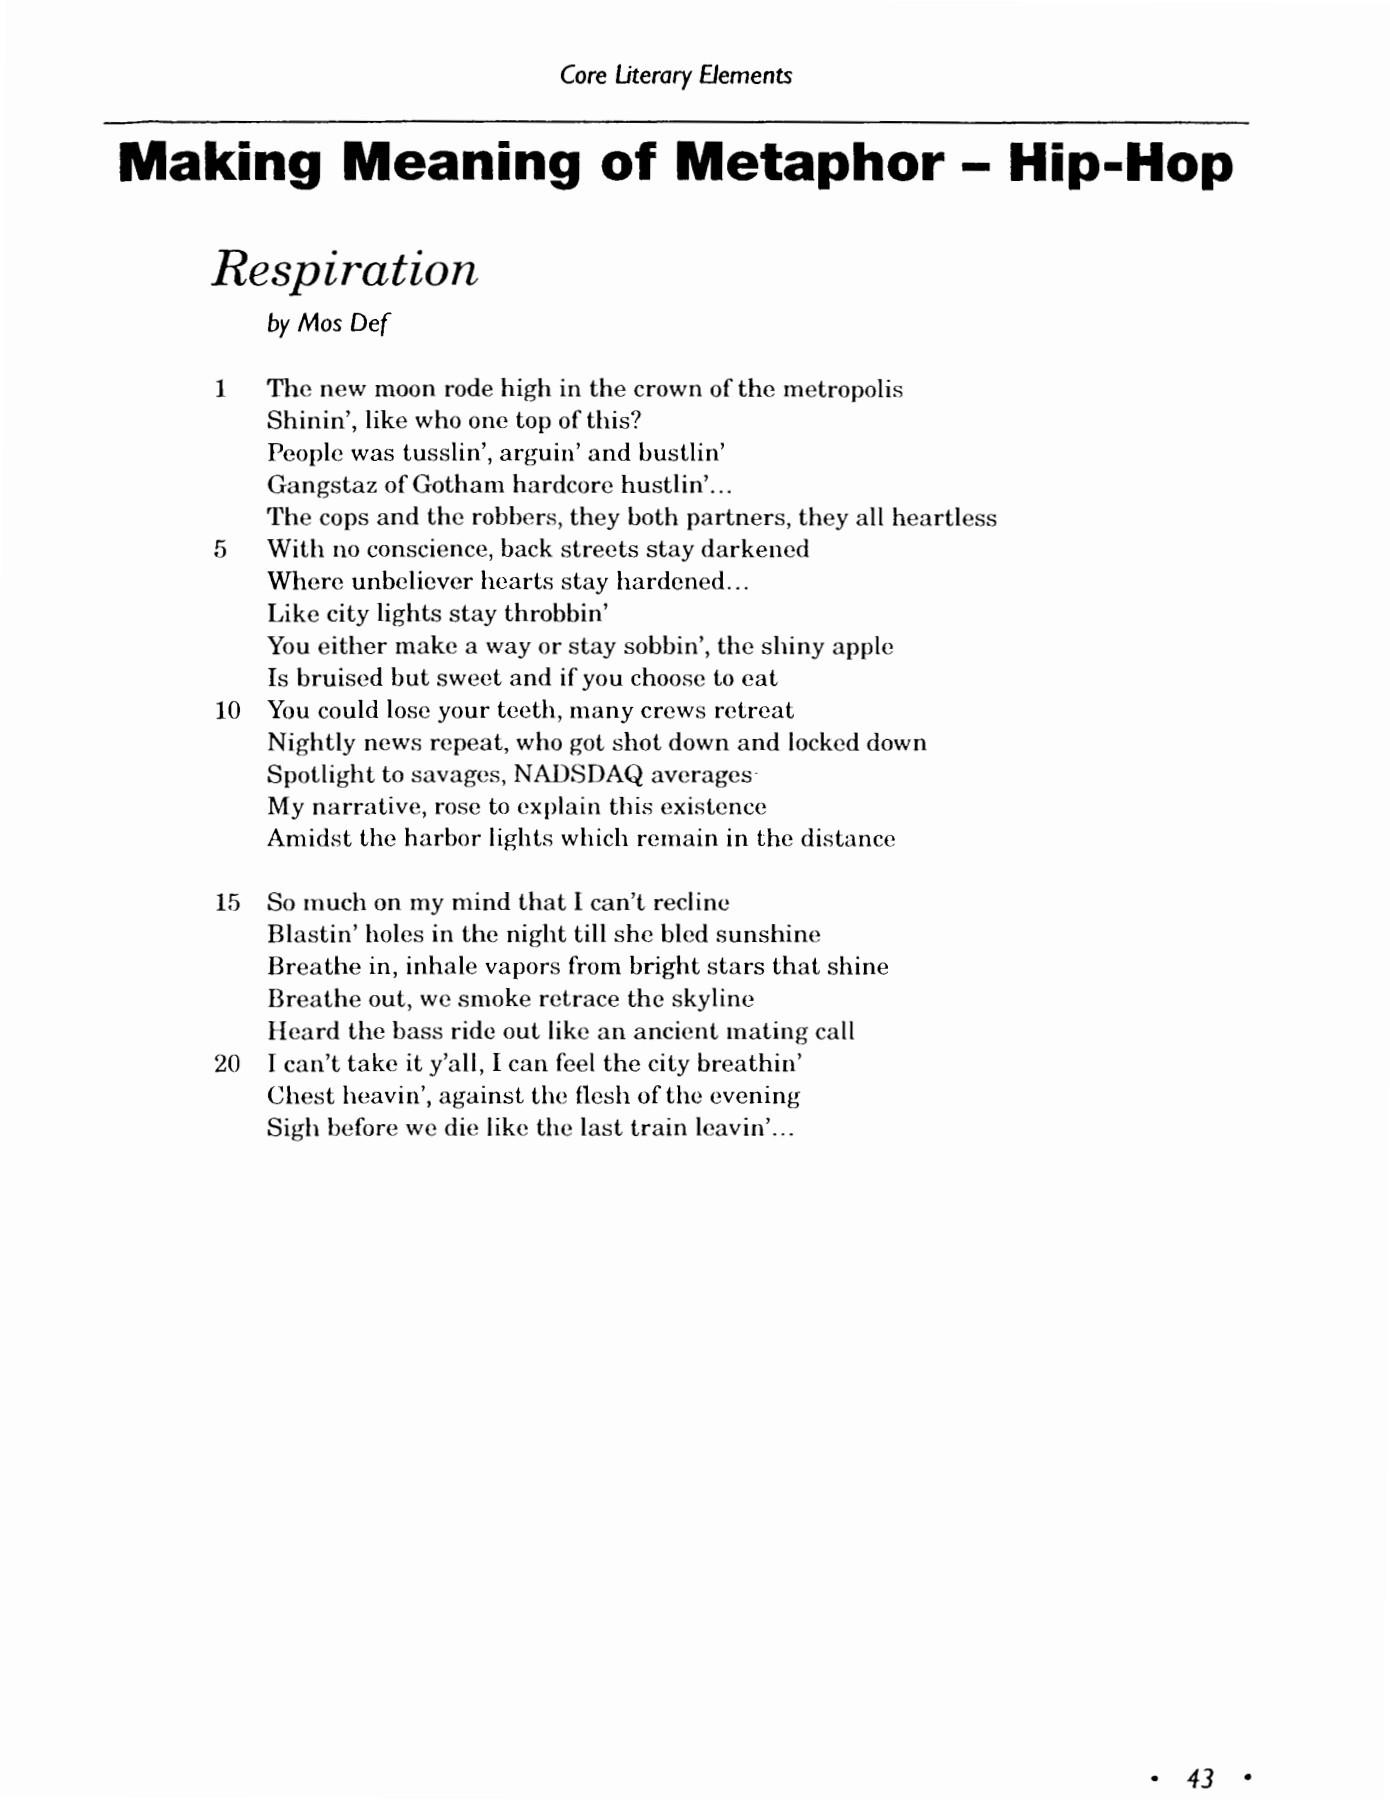 Metaphor Meanings Worksheet Answers